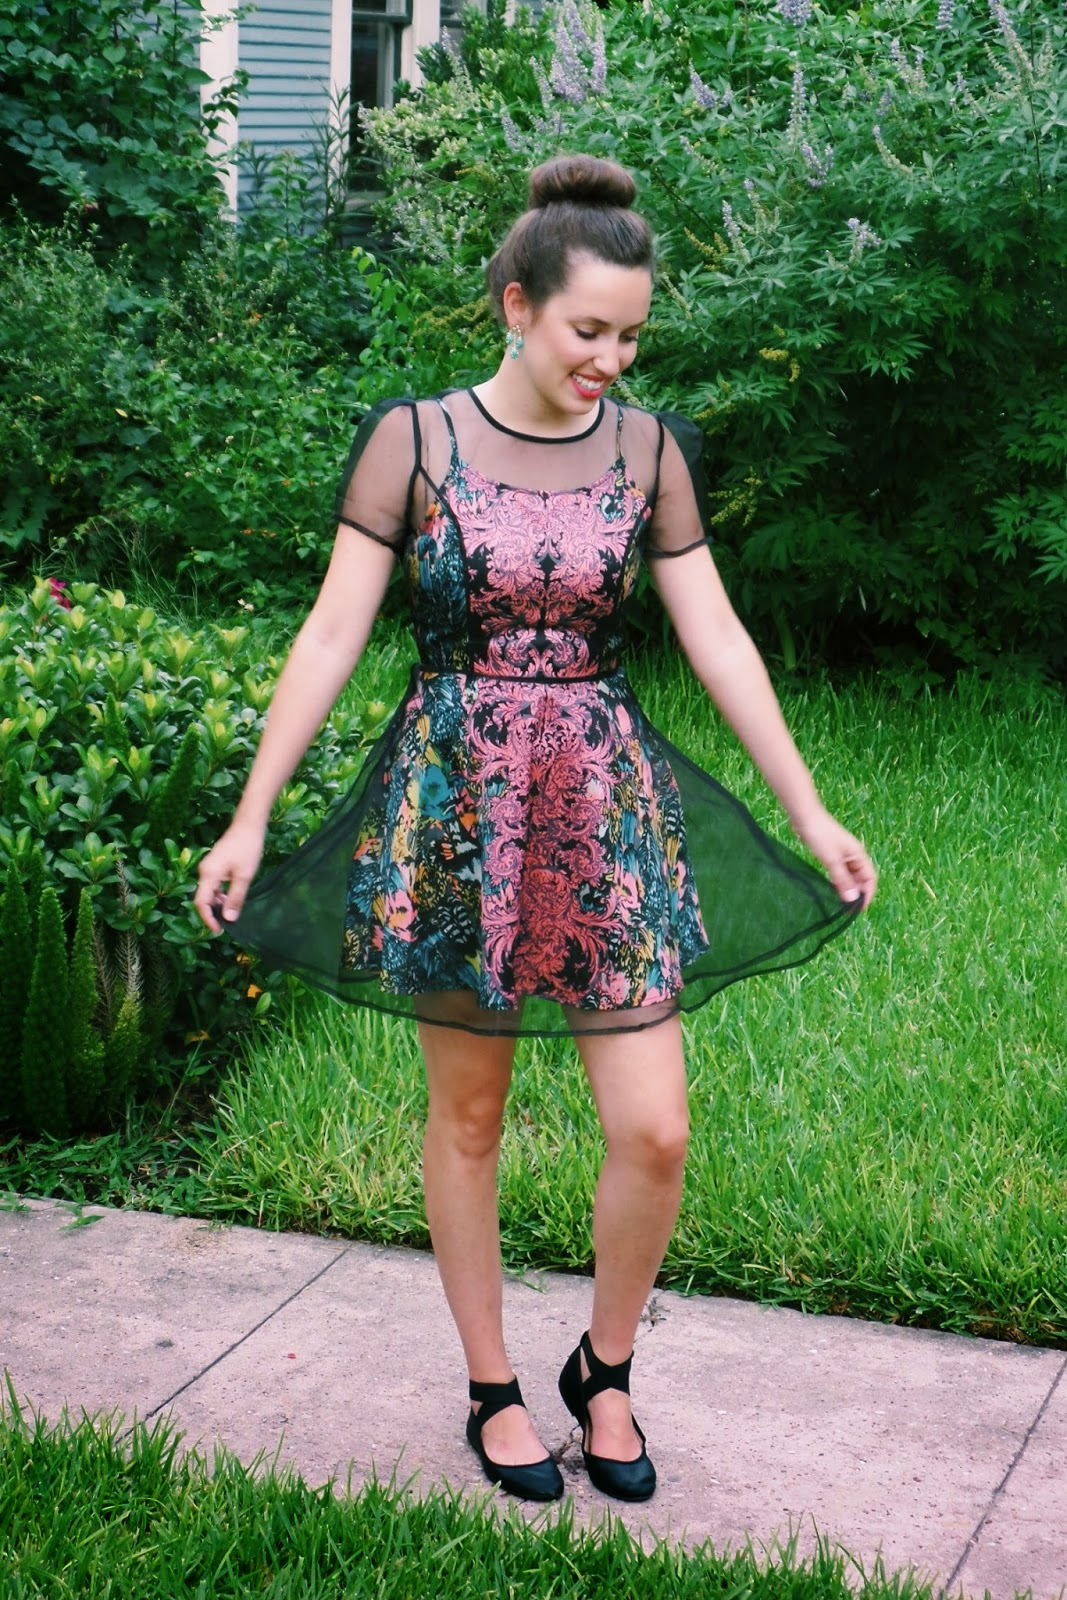 Trendy in Texas Blog, Trendy in Texas, Kissue TX, Kissue, Kissue Zaza Dress, Kissue Trendy in Texas, Kissue Sisters, Zaza Dress, Houston Fashion